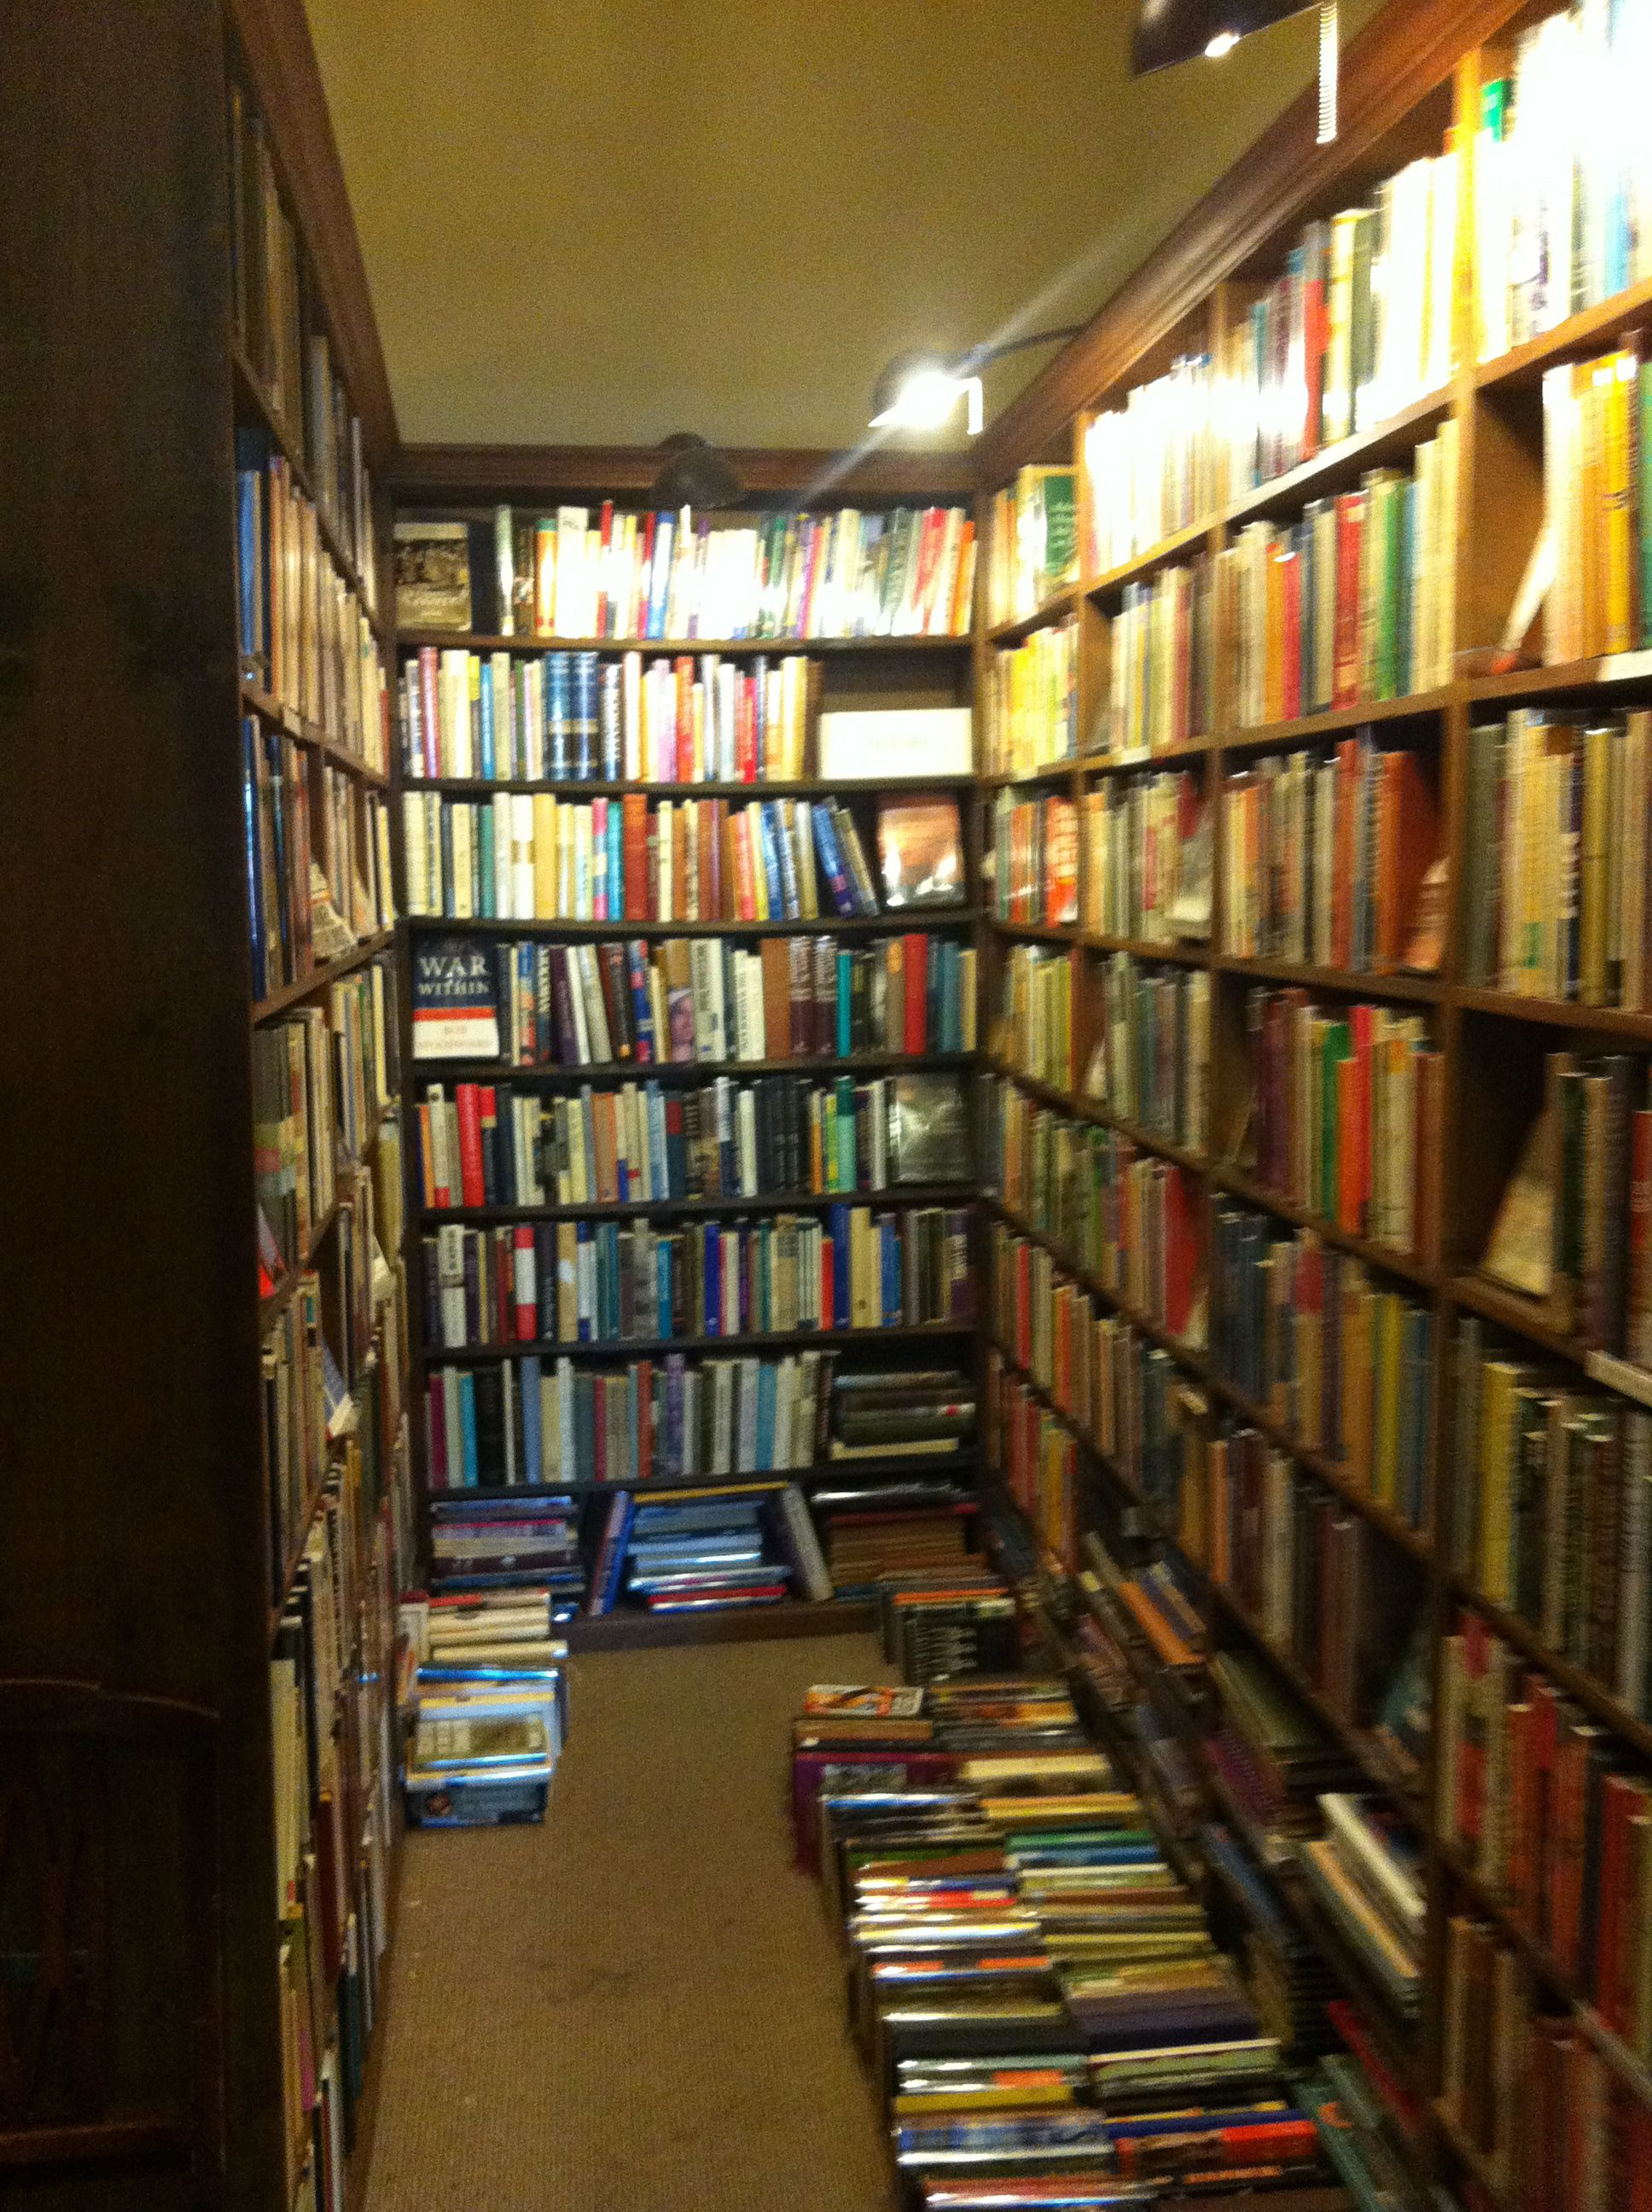 The Dusty Bookshelf Feels Like Home Bookshelves Home